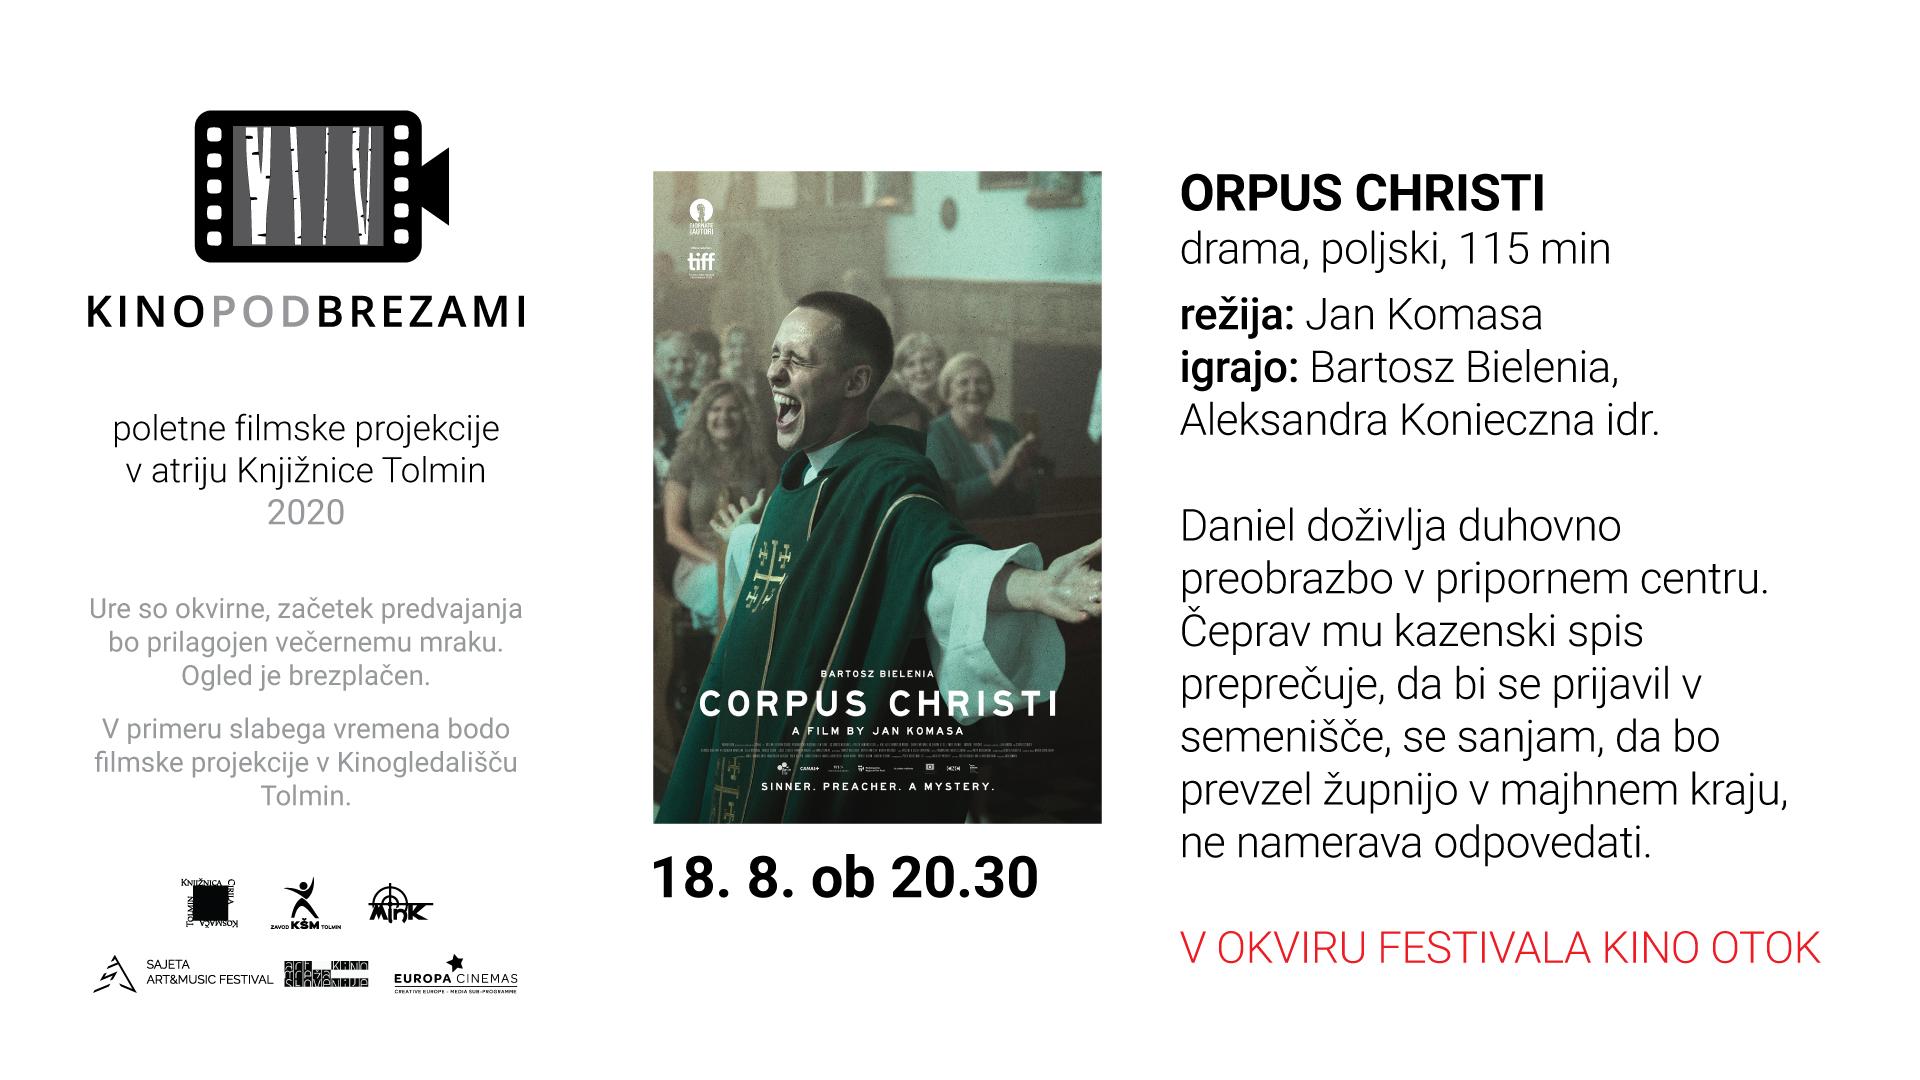 Kino pod brezami: CORPUS CHRISTI (drama, Kino Otok)